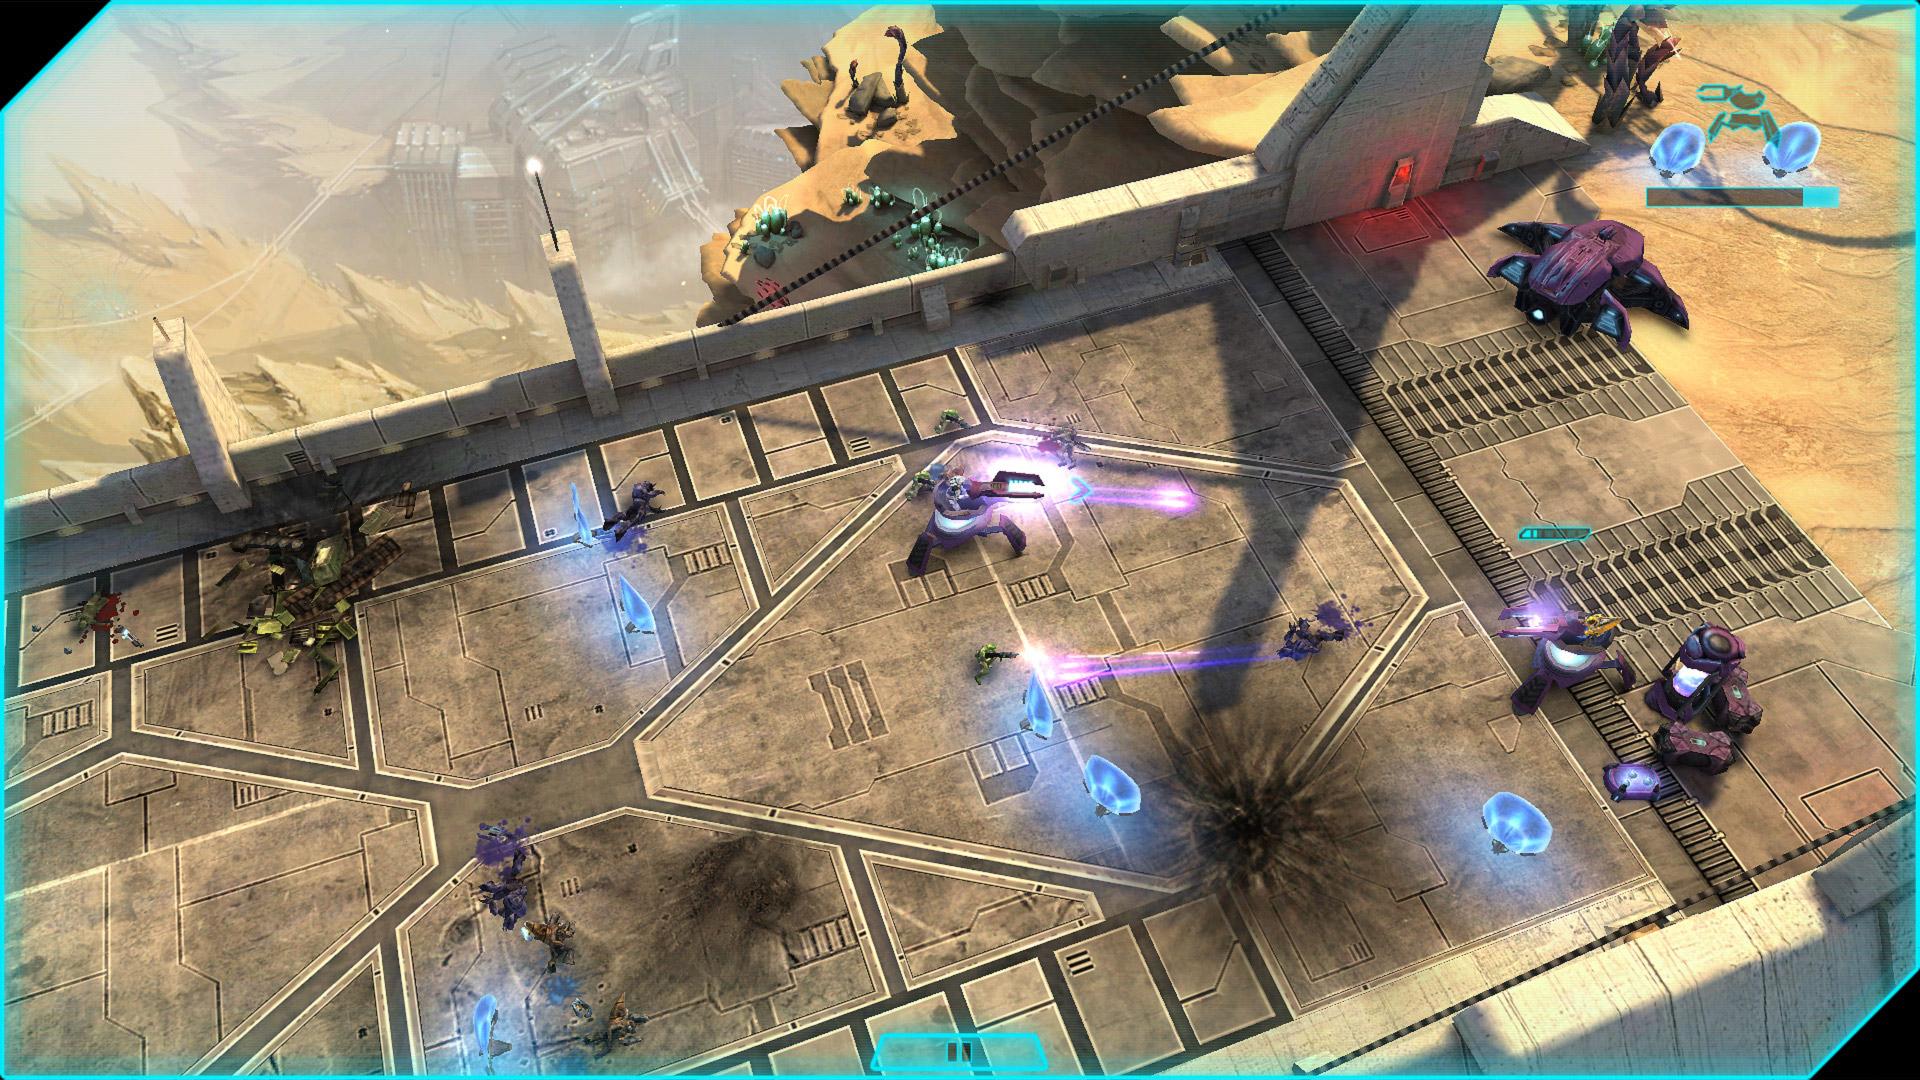 Halo: Spartan Assault Attacking Steam Next Week   News   Primagames.com